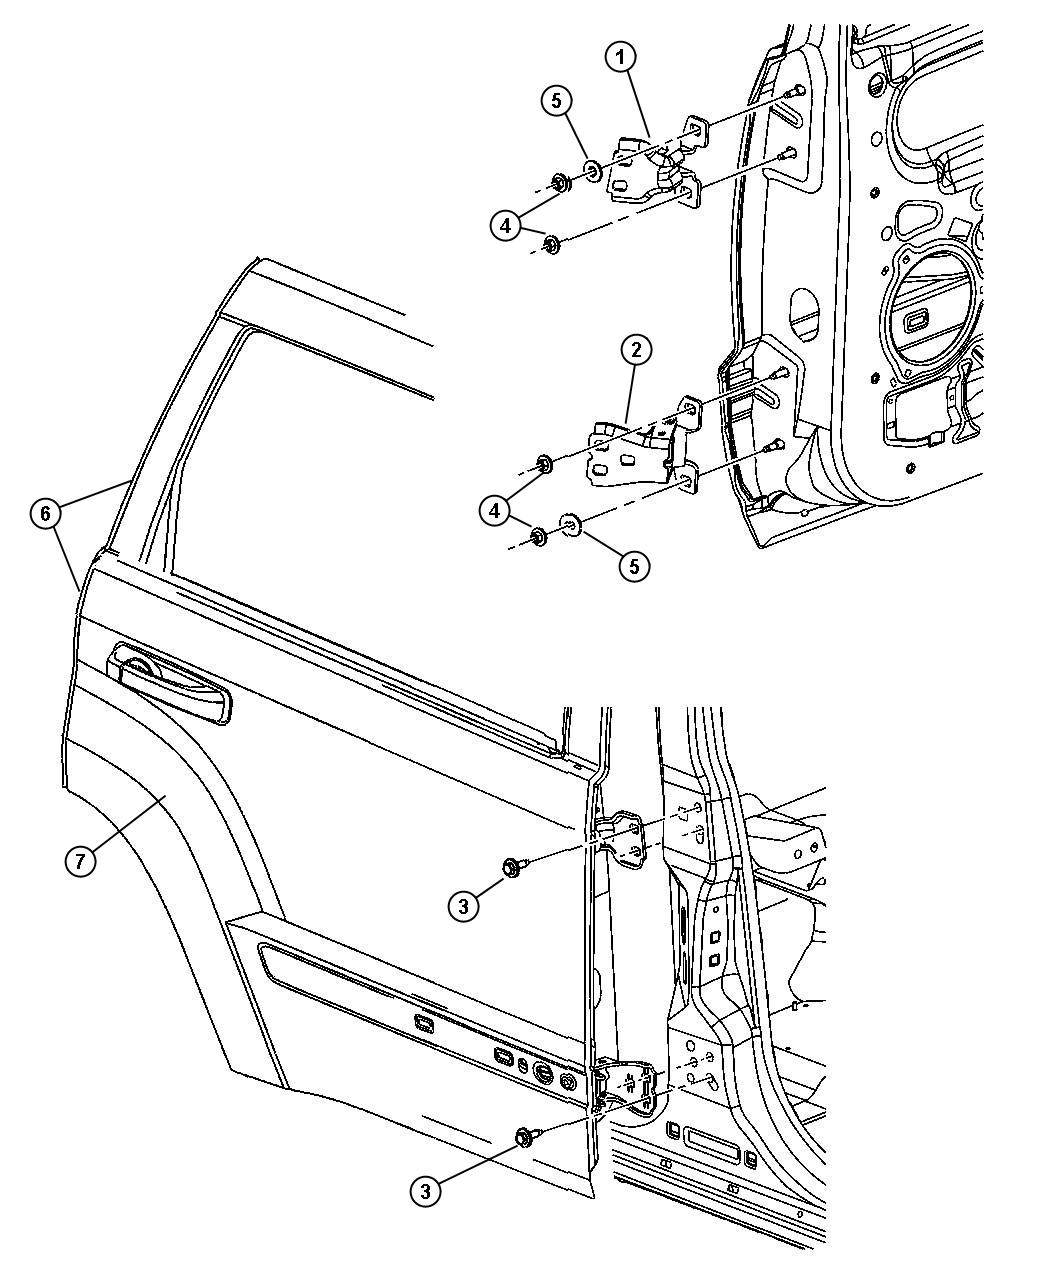 tags: #hid kit wiring diagram#xenon hid wiring diagram#h3 hid kit wiring  diagram#9007 headlight wiring diagram#xenon hid headlight wiring diagram#bi  xenon